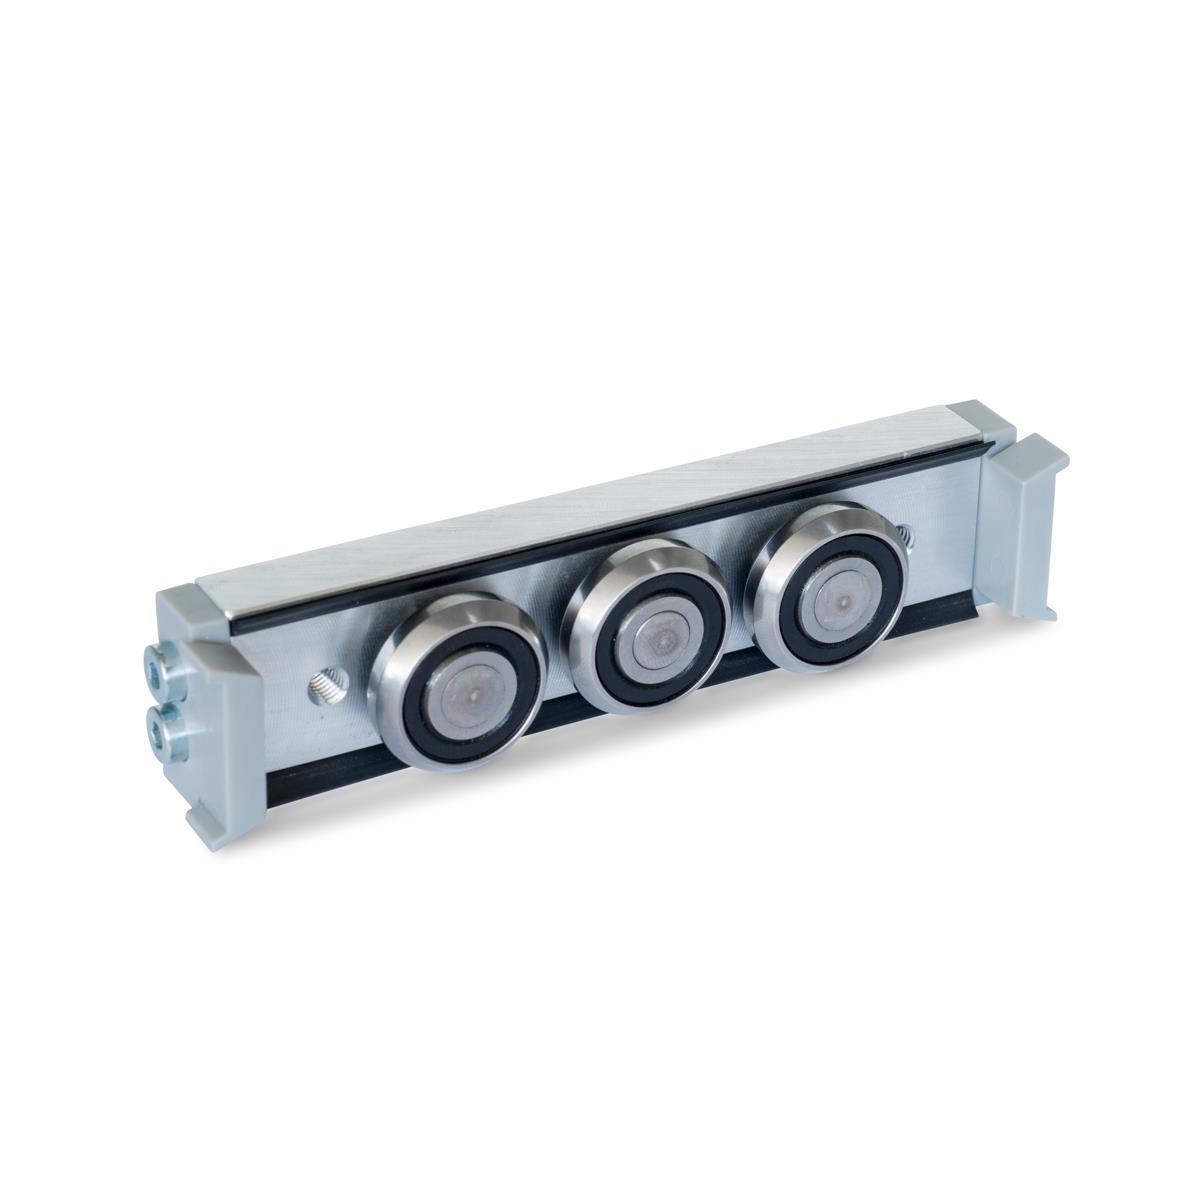 GN 2424 Carros de rodillos, aluminio o acero, medidas métricas, para rieles de guías de rodillo GN 2422 Tipo: N - Carro de rodillos normal, disposición central Versión: U - con junta de fricción para riel de cojinetes flotantes (riel en U)